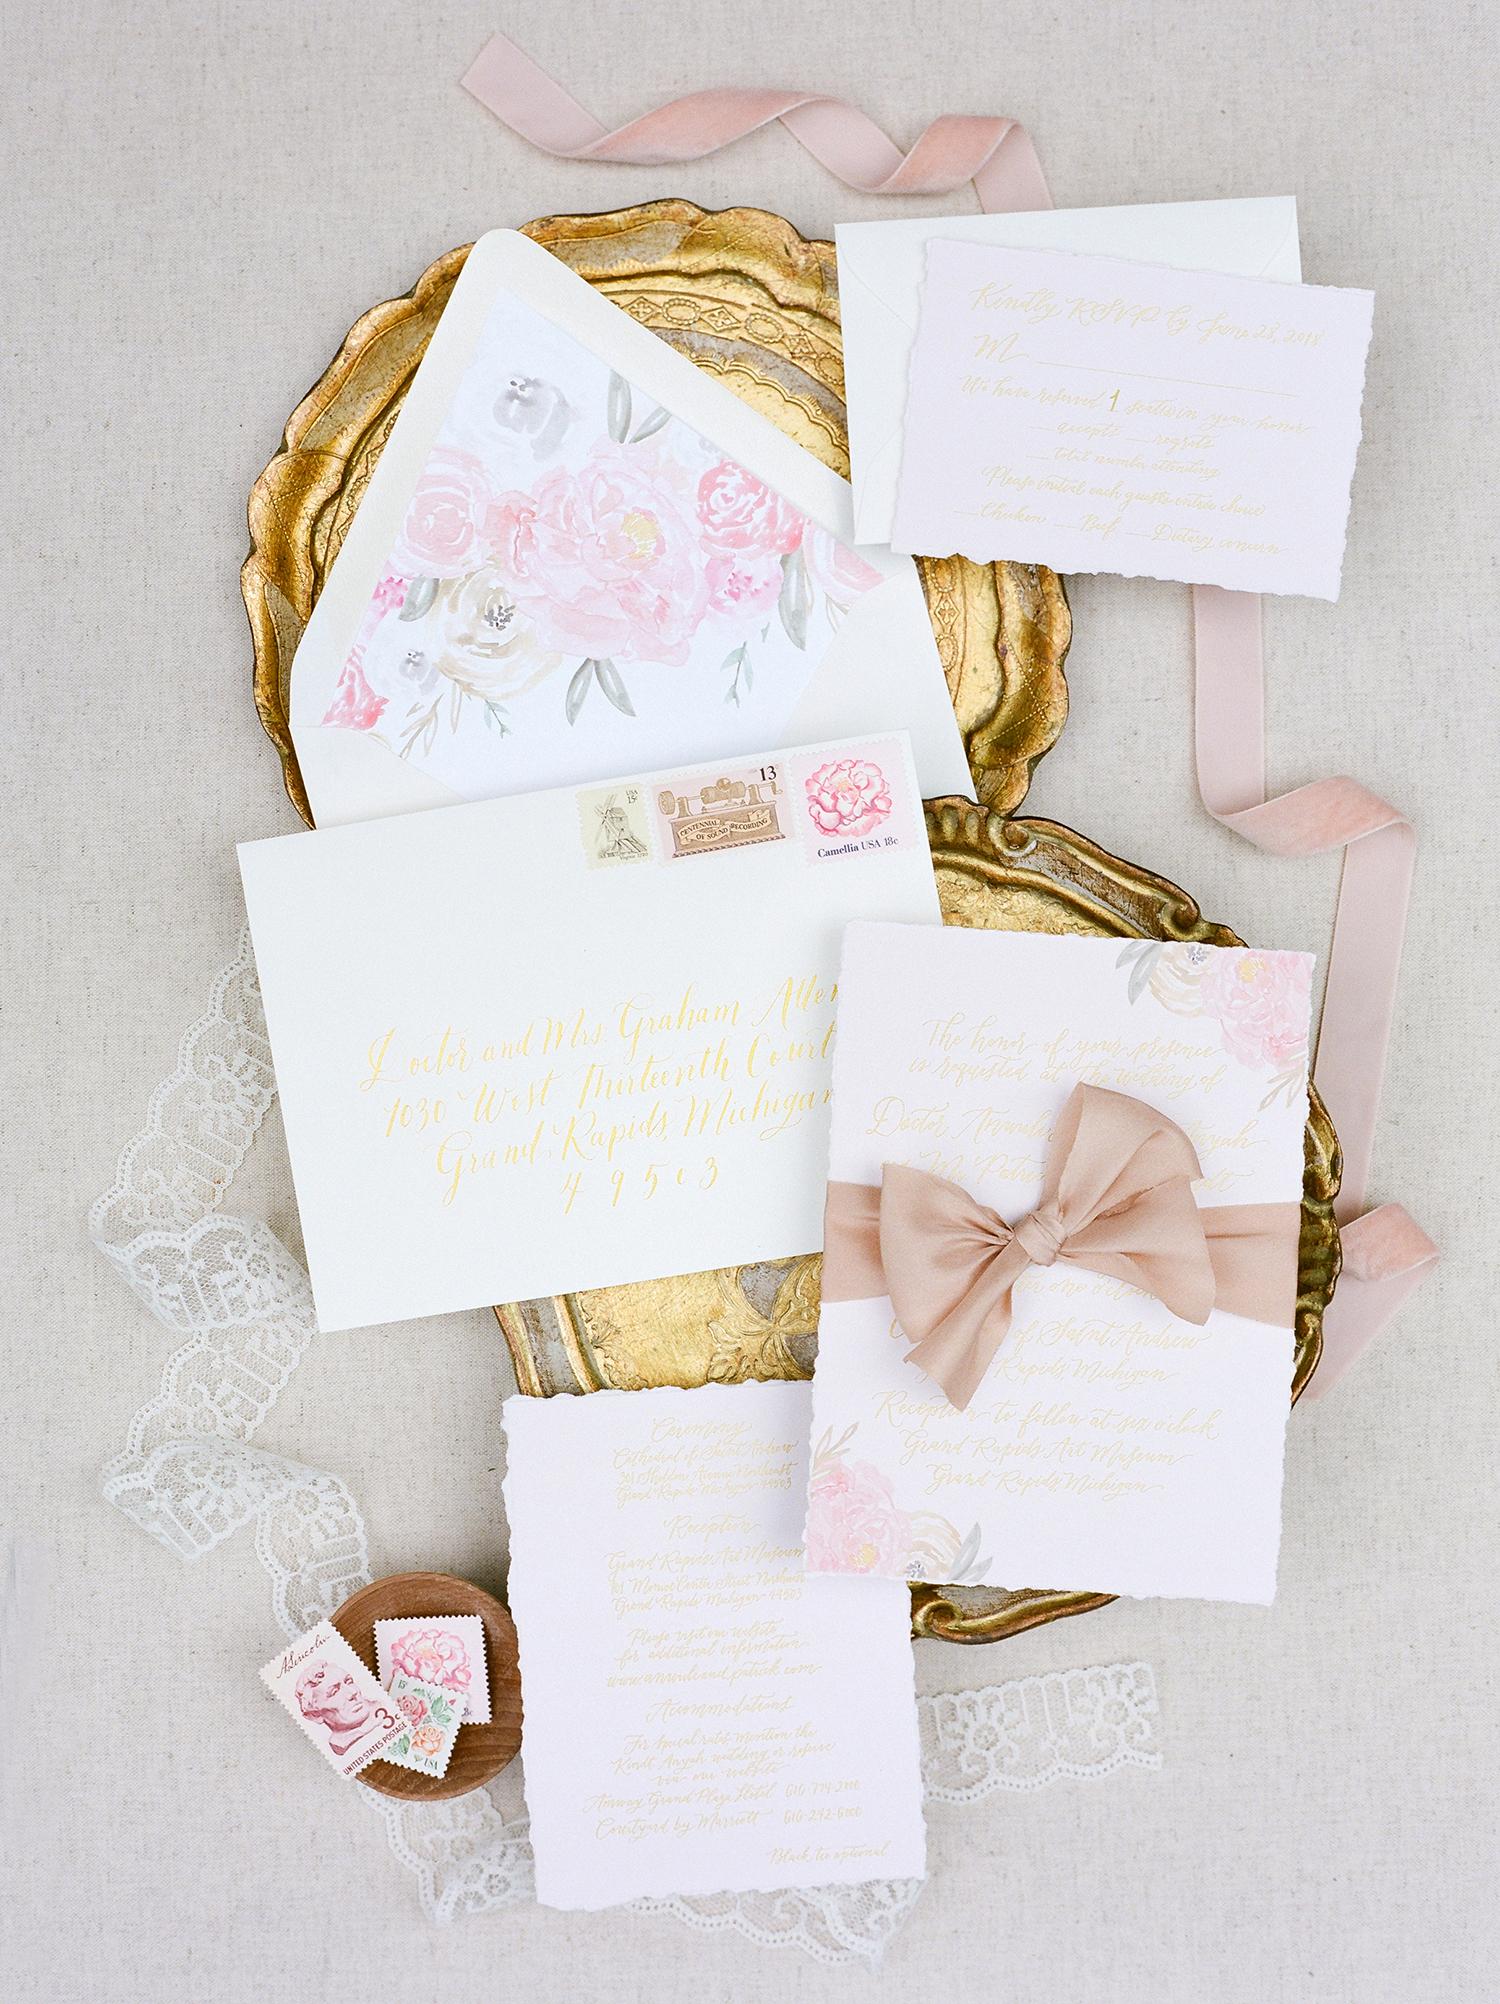 anwuli patrick wedding invitation